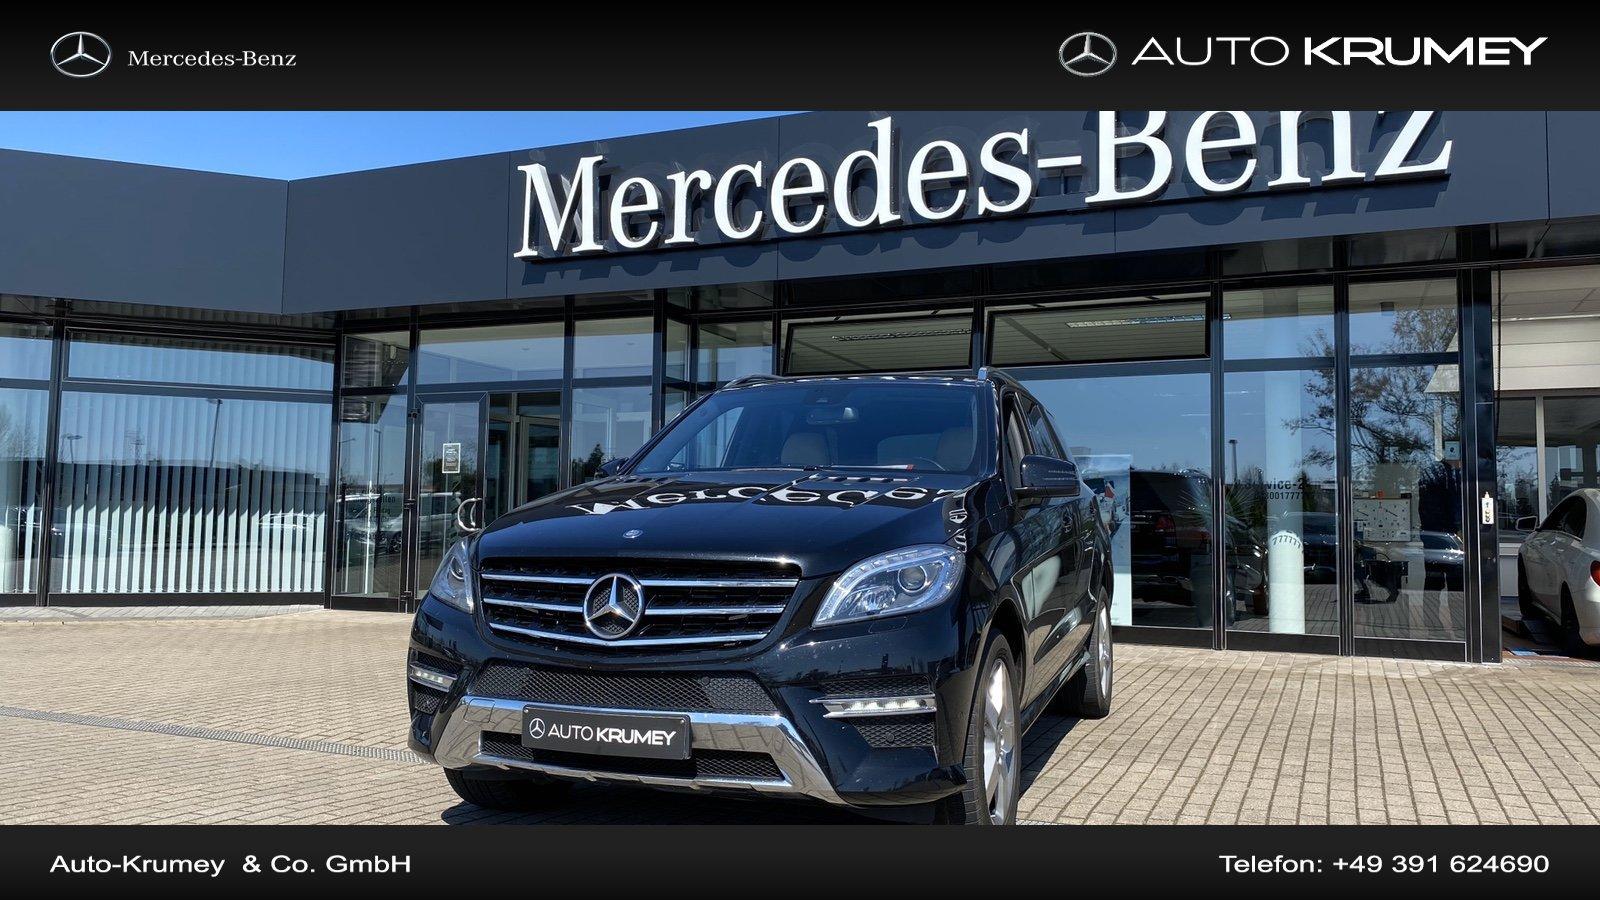 Mercedes-Benz ML 350 CDI DPF 4MATIC BlueTec COMAND,AMG-Styling, Jahr 2015, Diesel